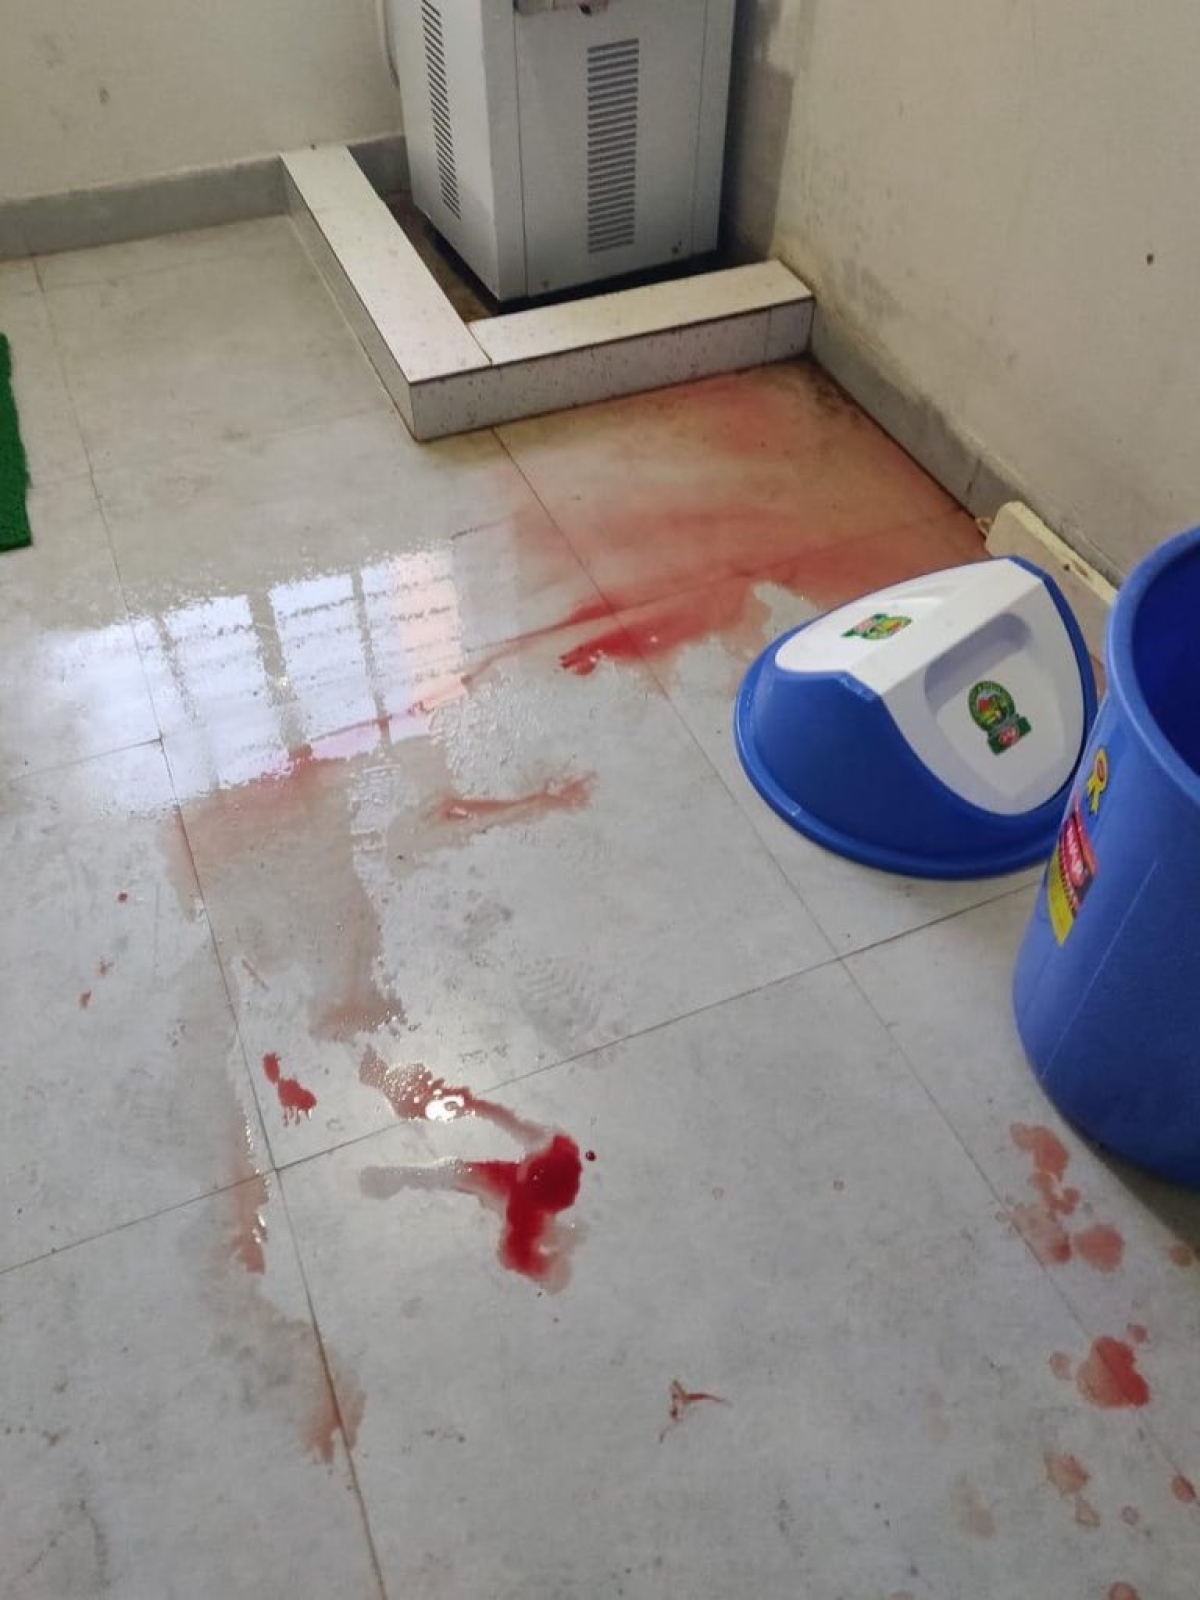 Scenes of a blood bath at KIIT School of Law.